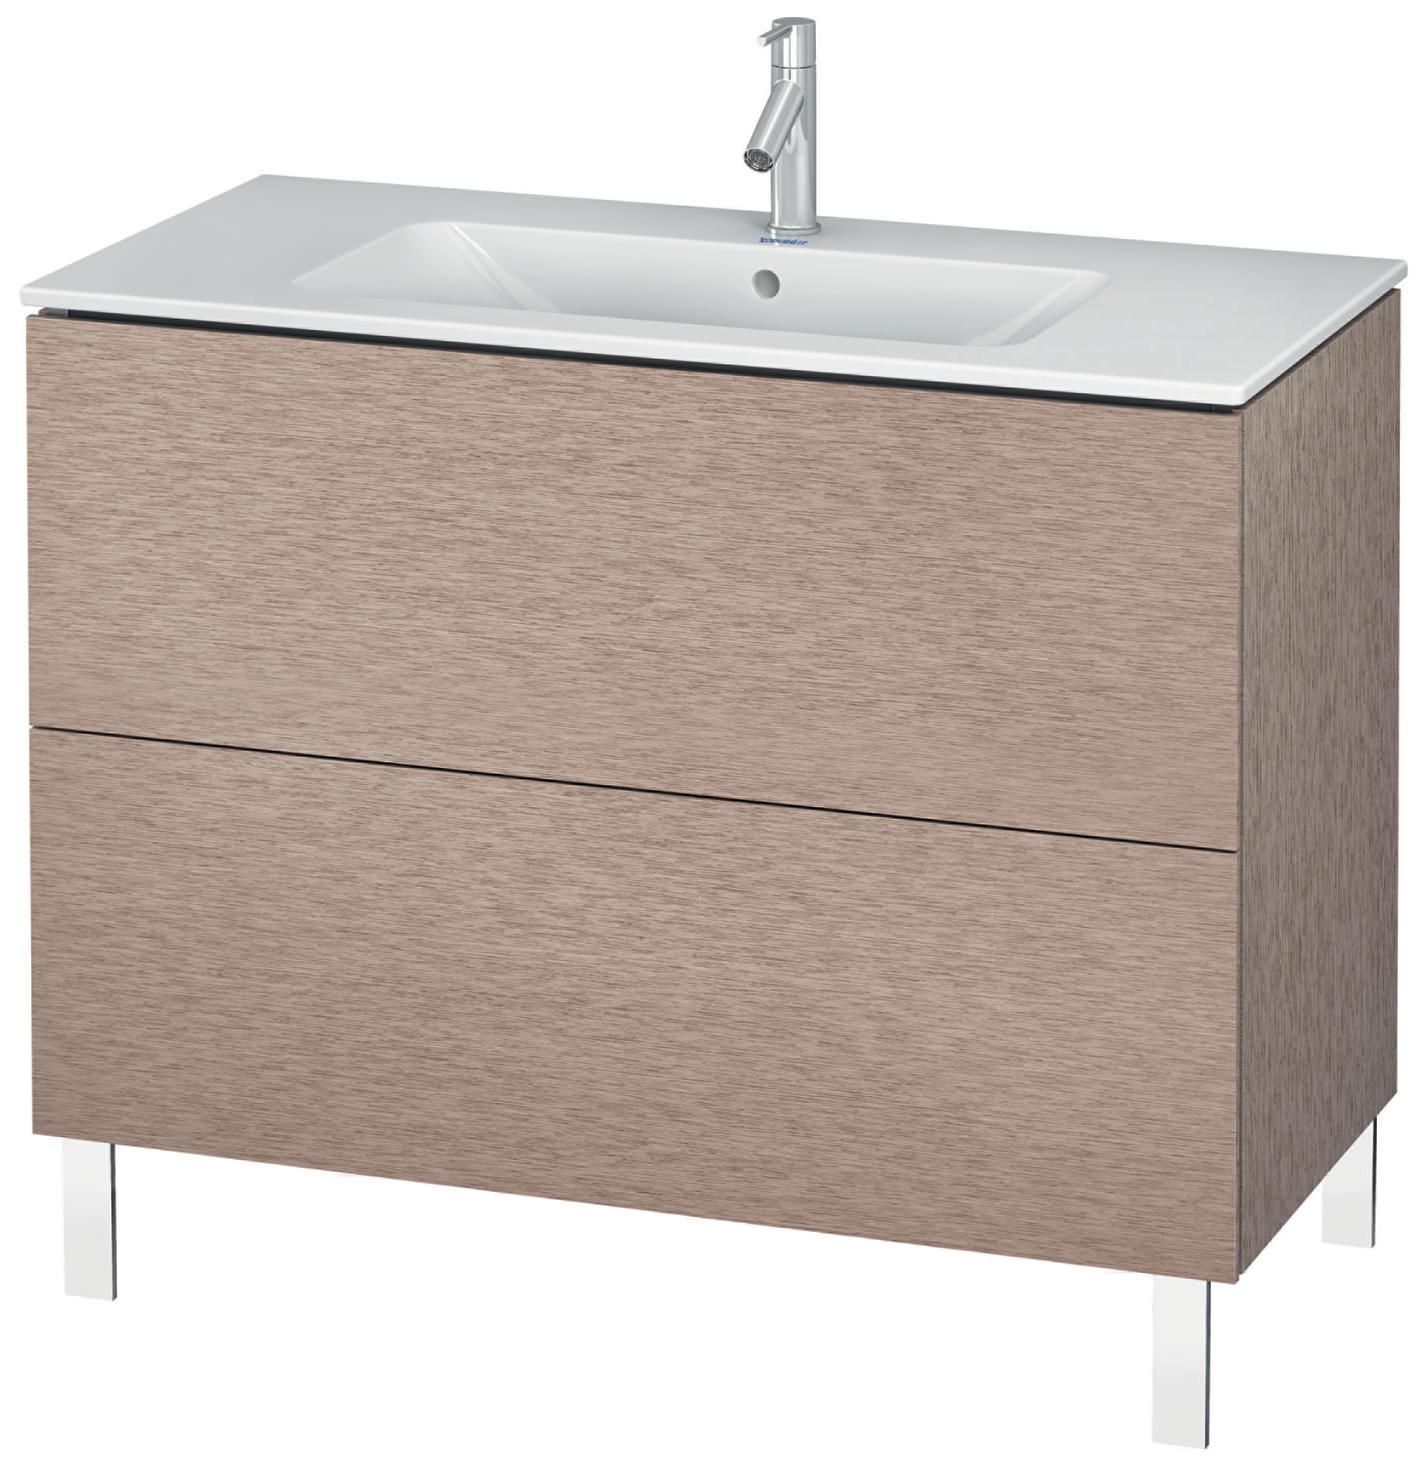 duravit l cube 1020mm floor standing vanity unit with me. Black Bedroom Furniture Sets. Home Design Ideas